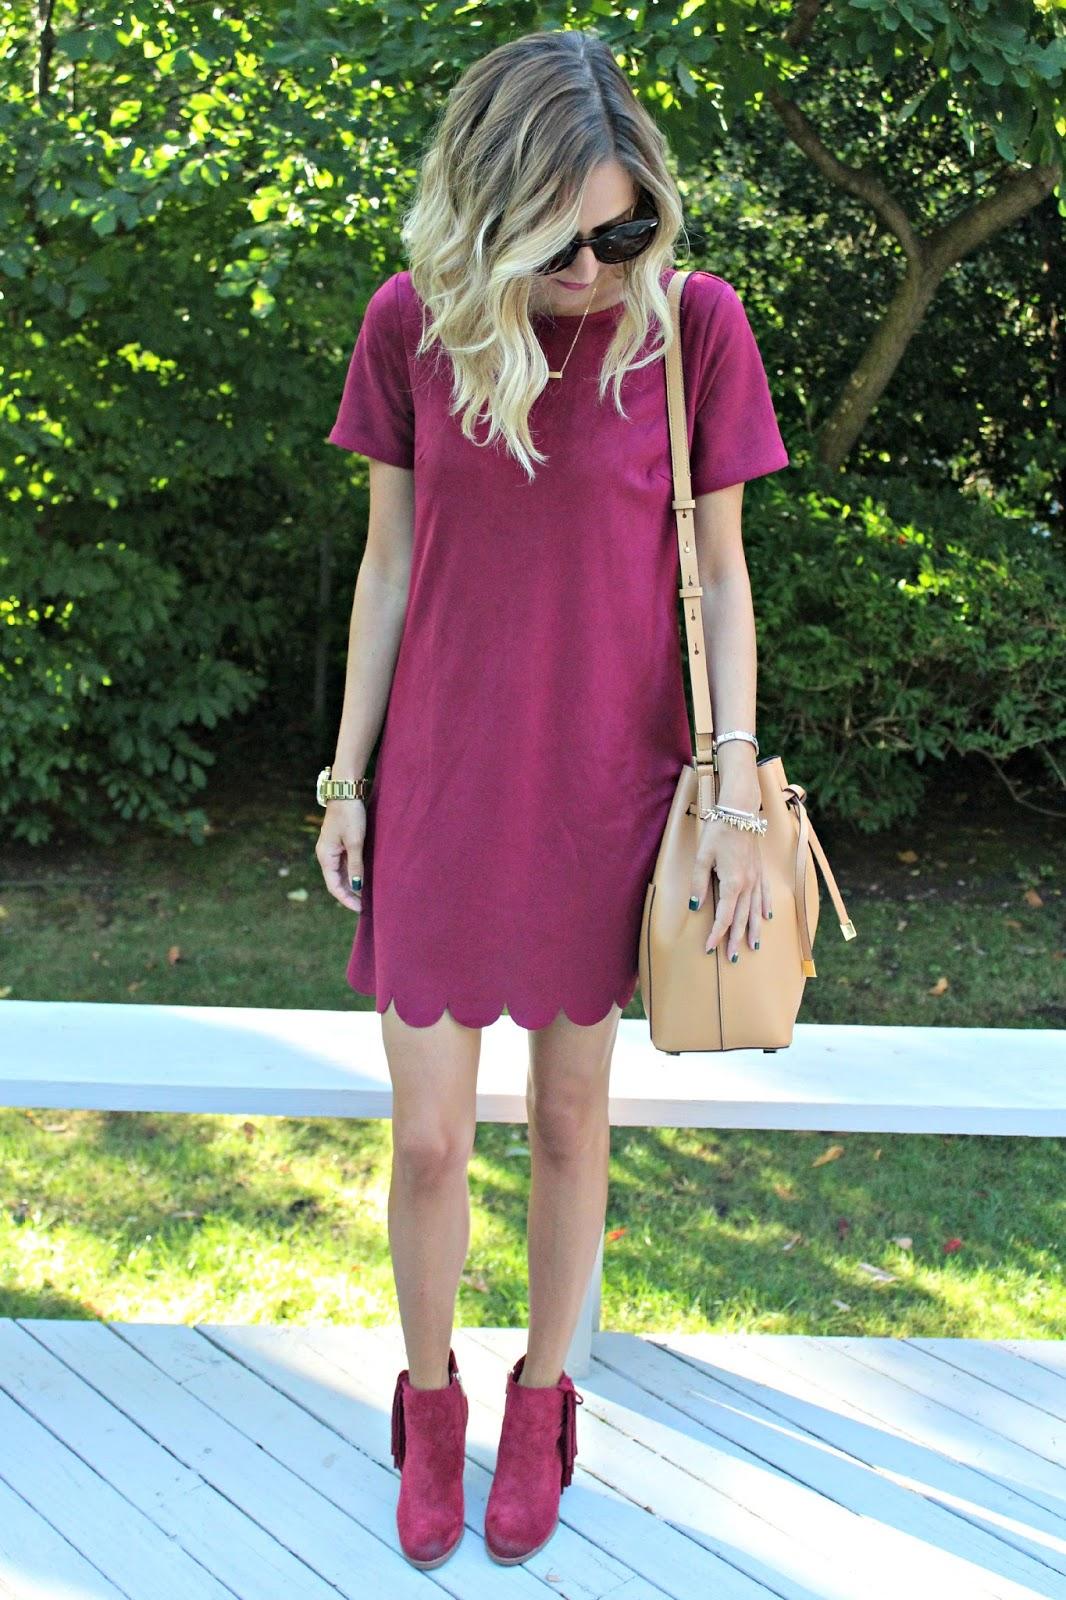 burgundy dress and booties